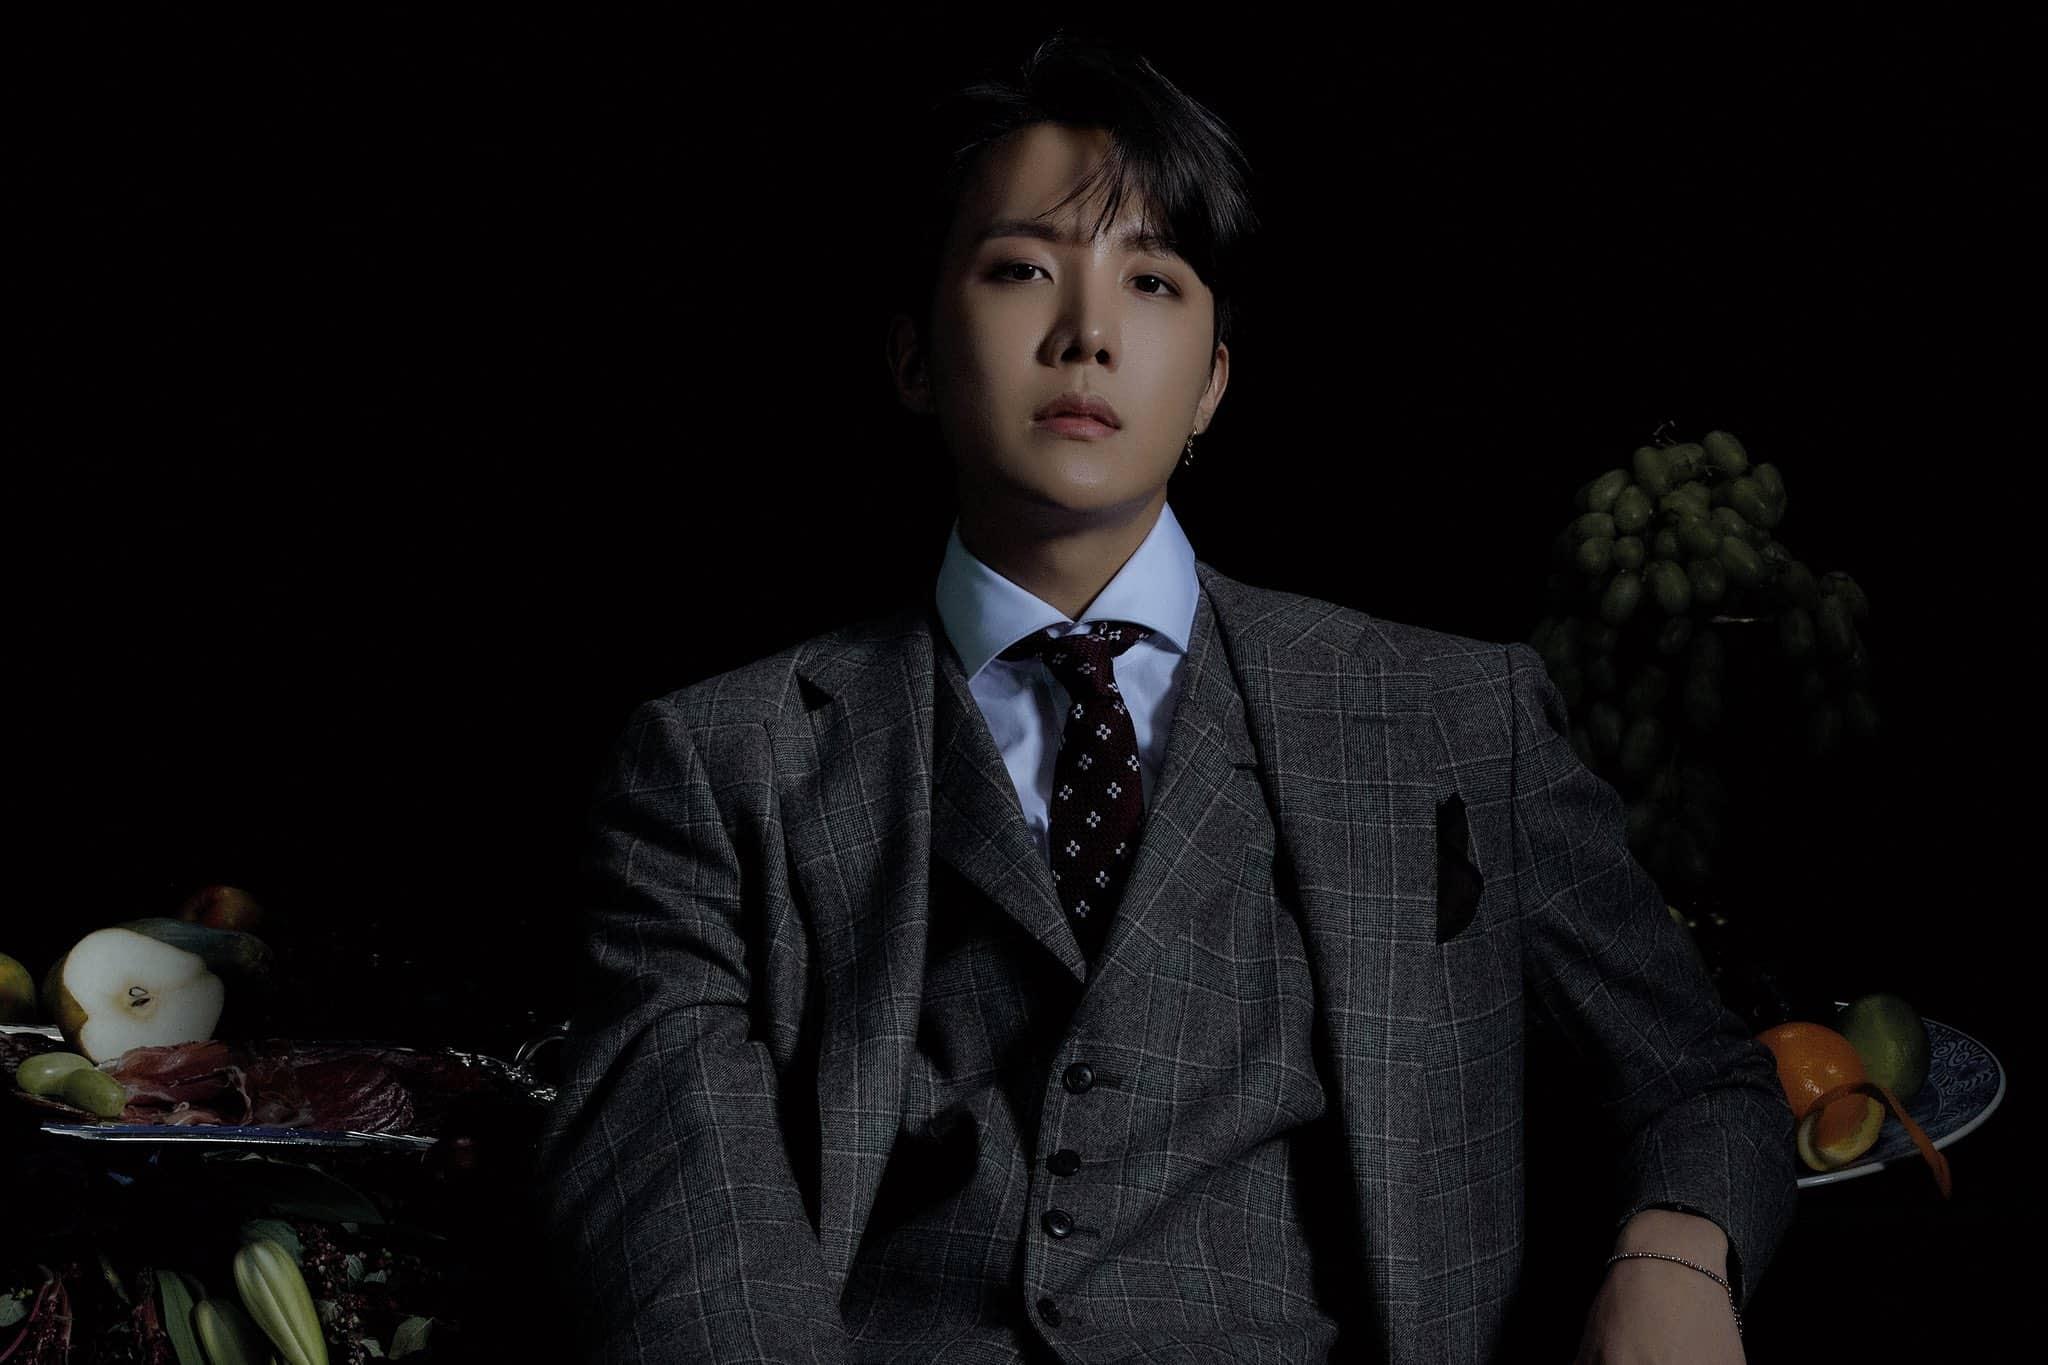 BTS member jung ho seok J-Hope